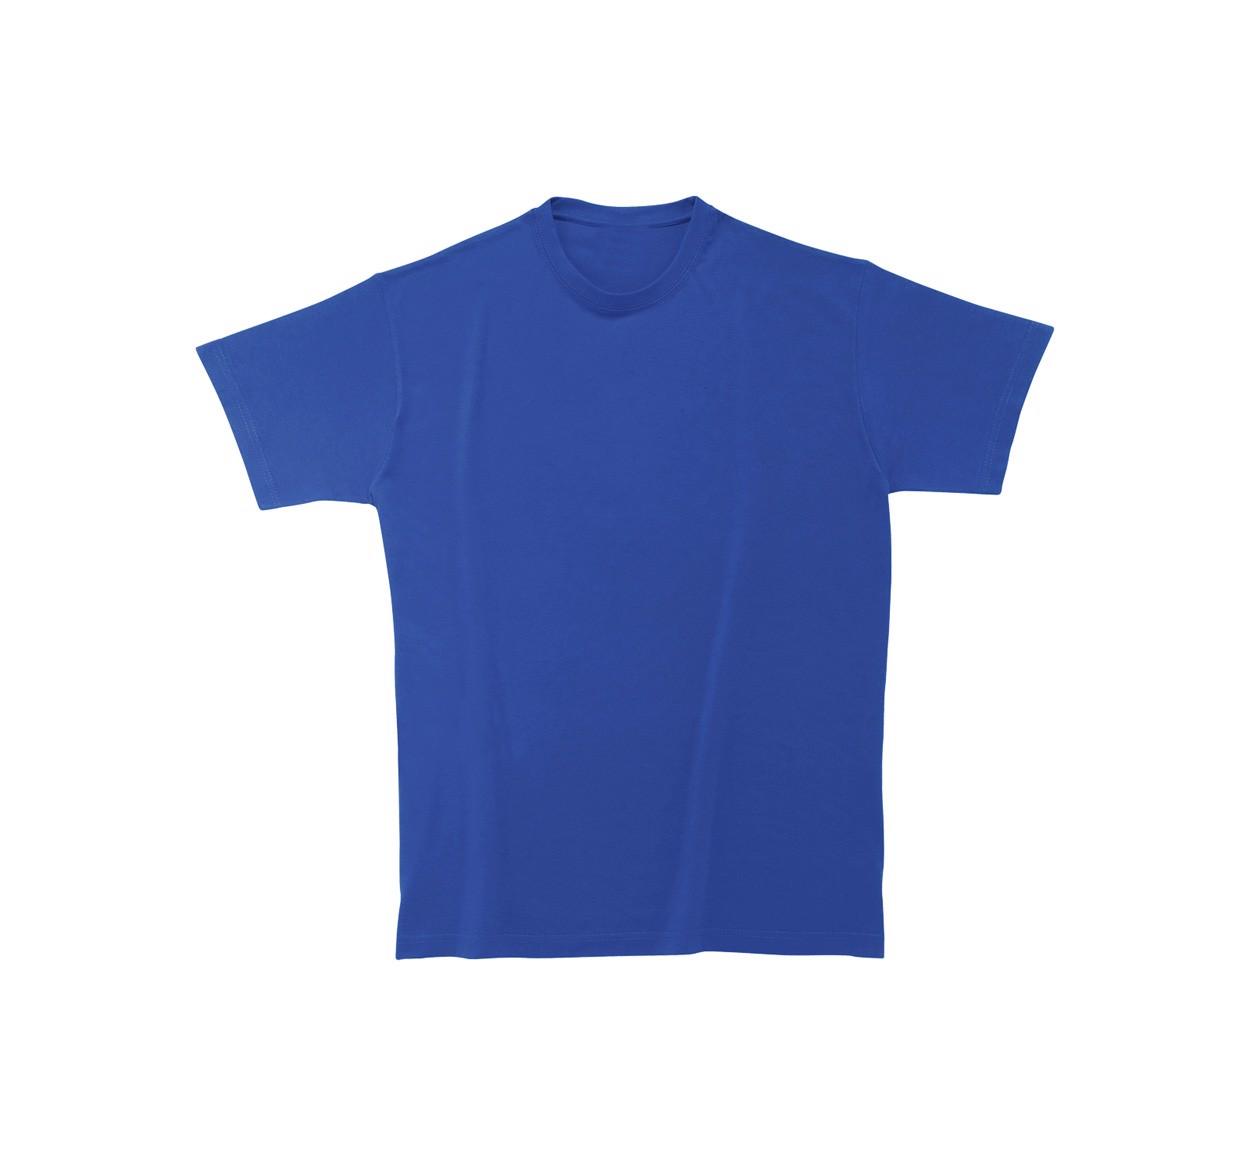 Tricou Bărbați Softstyle Man - Albastru / XXL